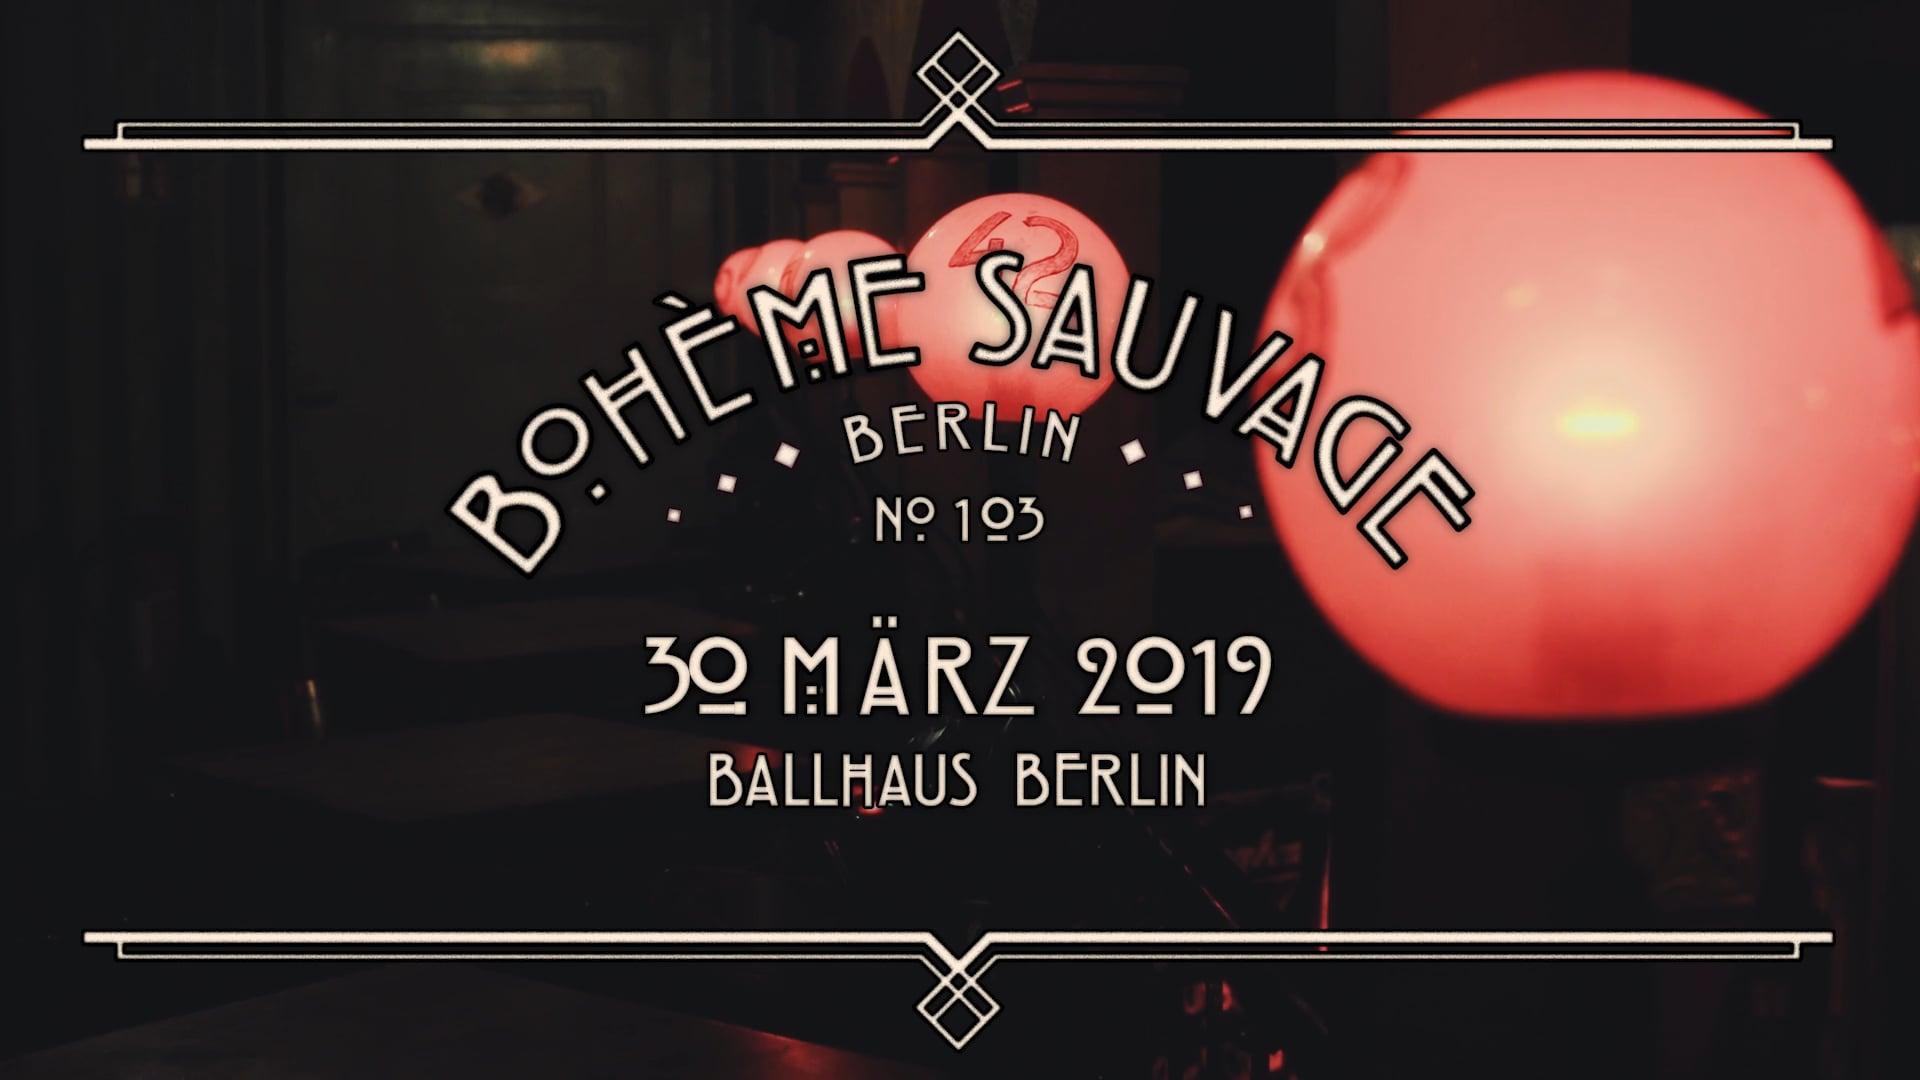 Bohème Sauvage Berlin Nº103 - 30. März 2019 - Ballhaus